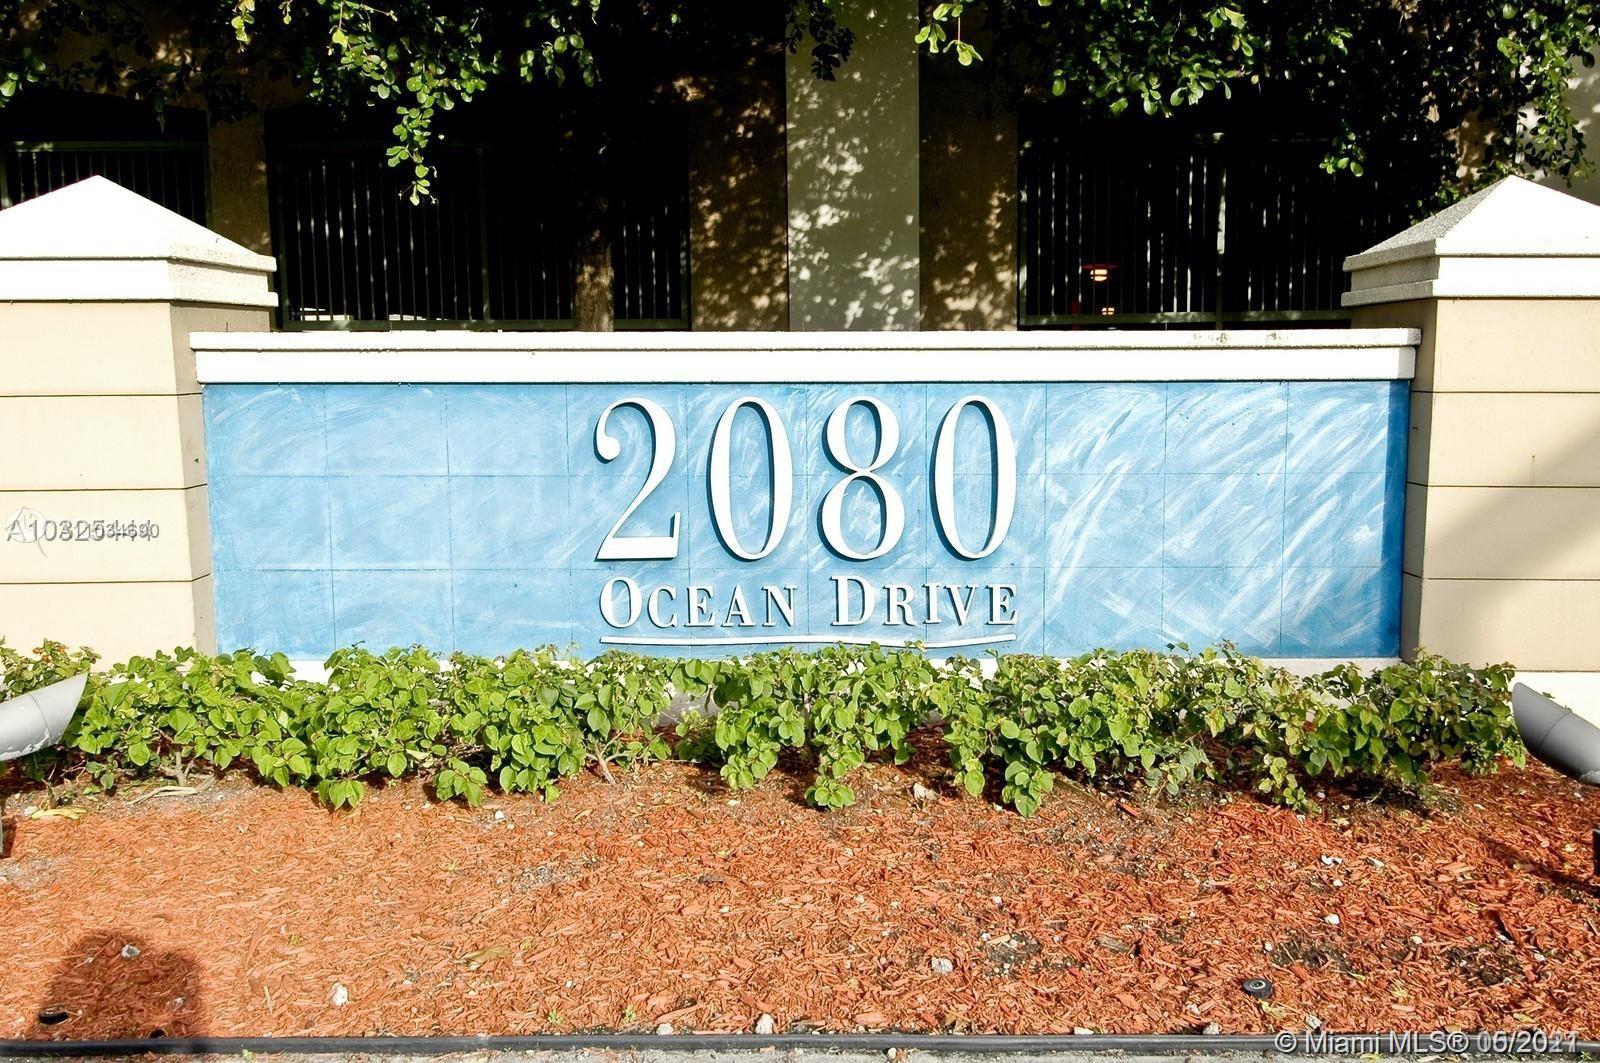 2080 Hallandale #201 - 2080 S Ocean Dr #201, Hallandale Beach, FL 33009